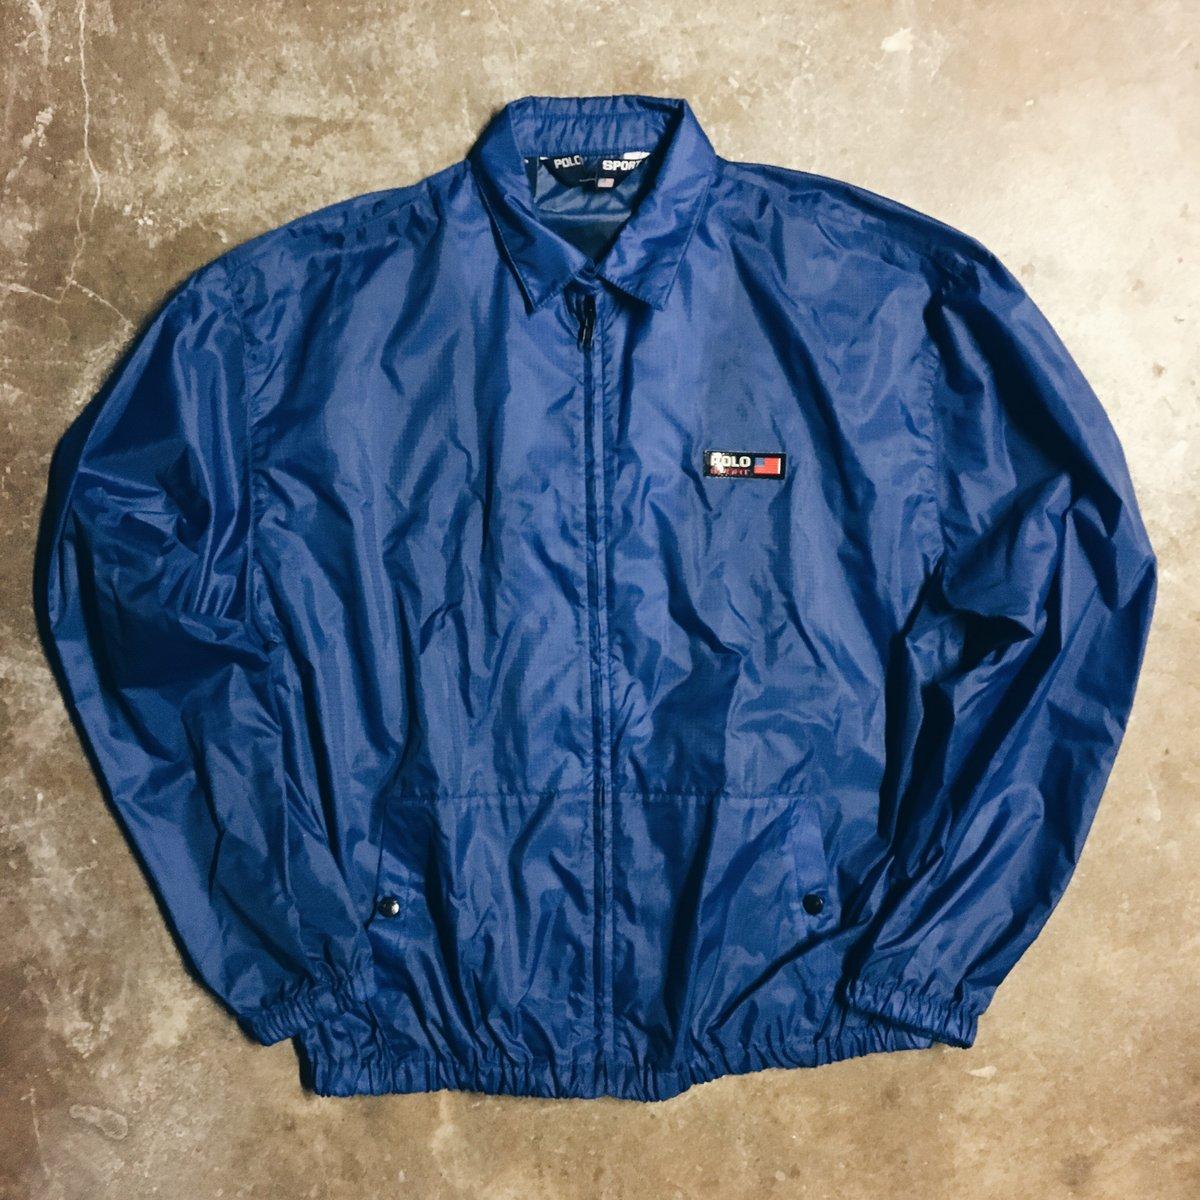 Image of Original 90's Polo Sport 3M Coaches Jacket.